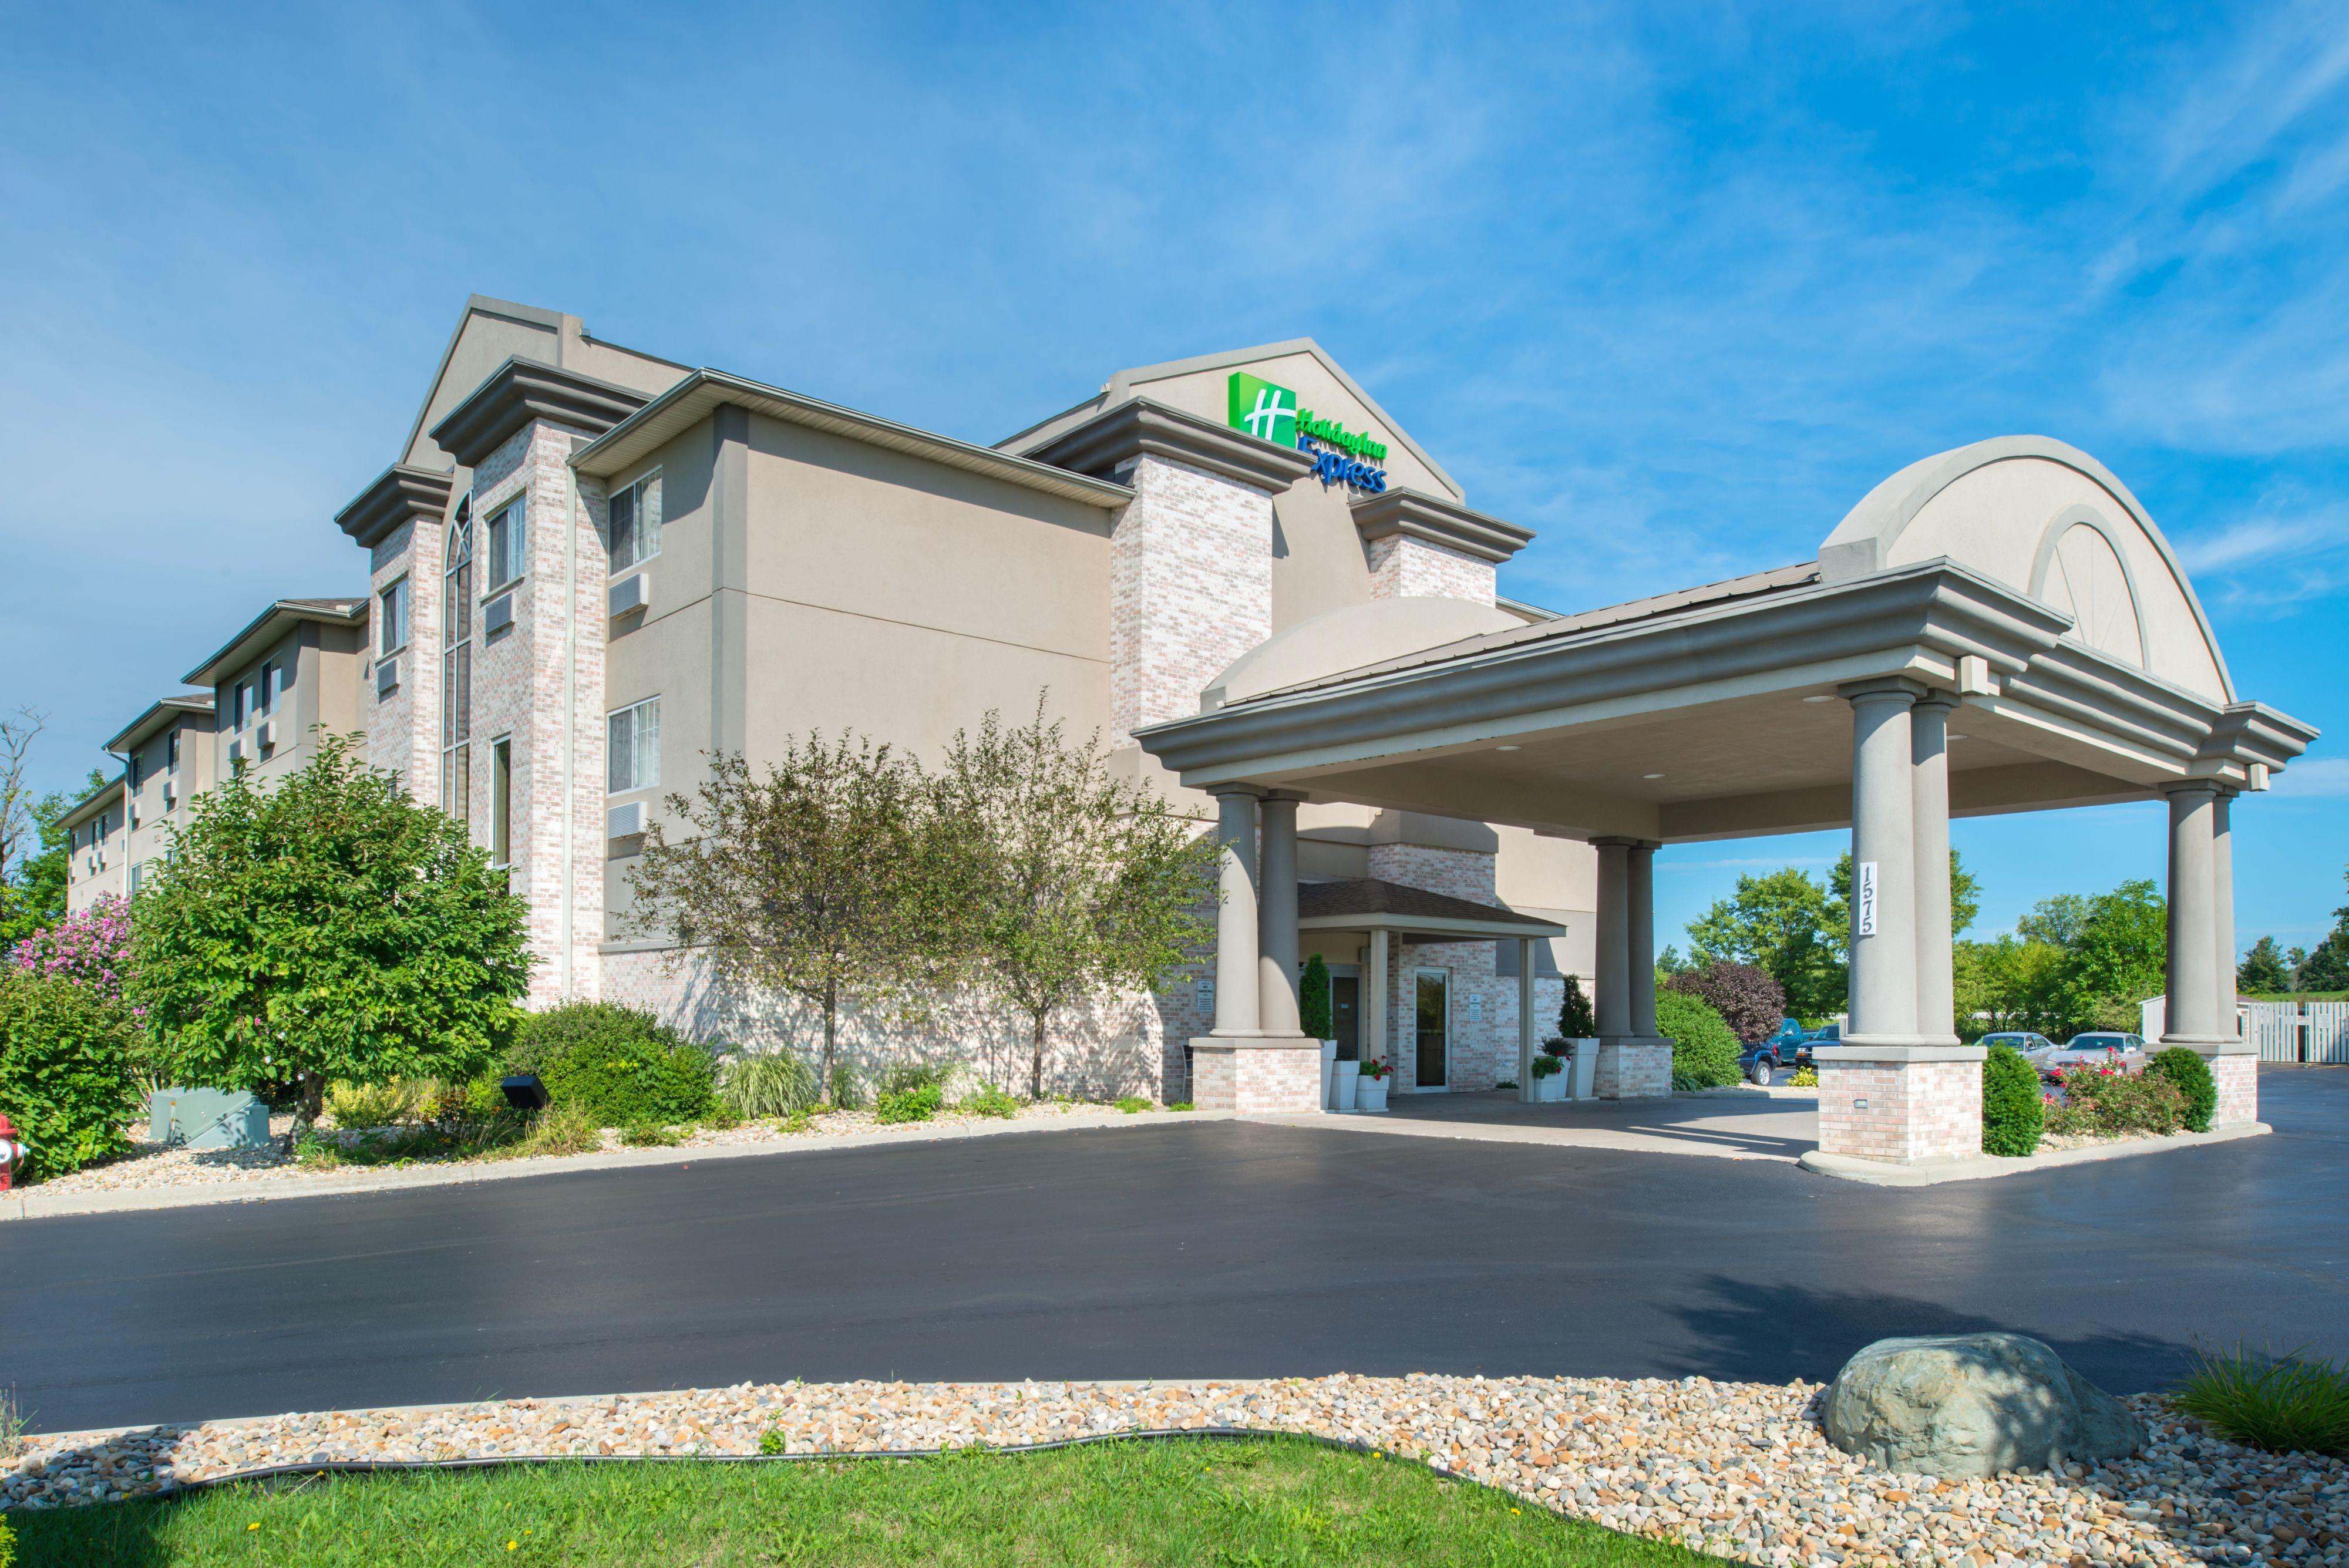 Motels In Montpelier Ohio